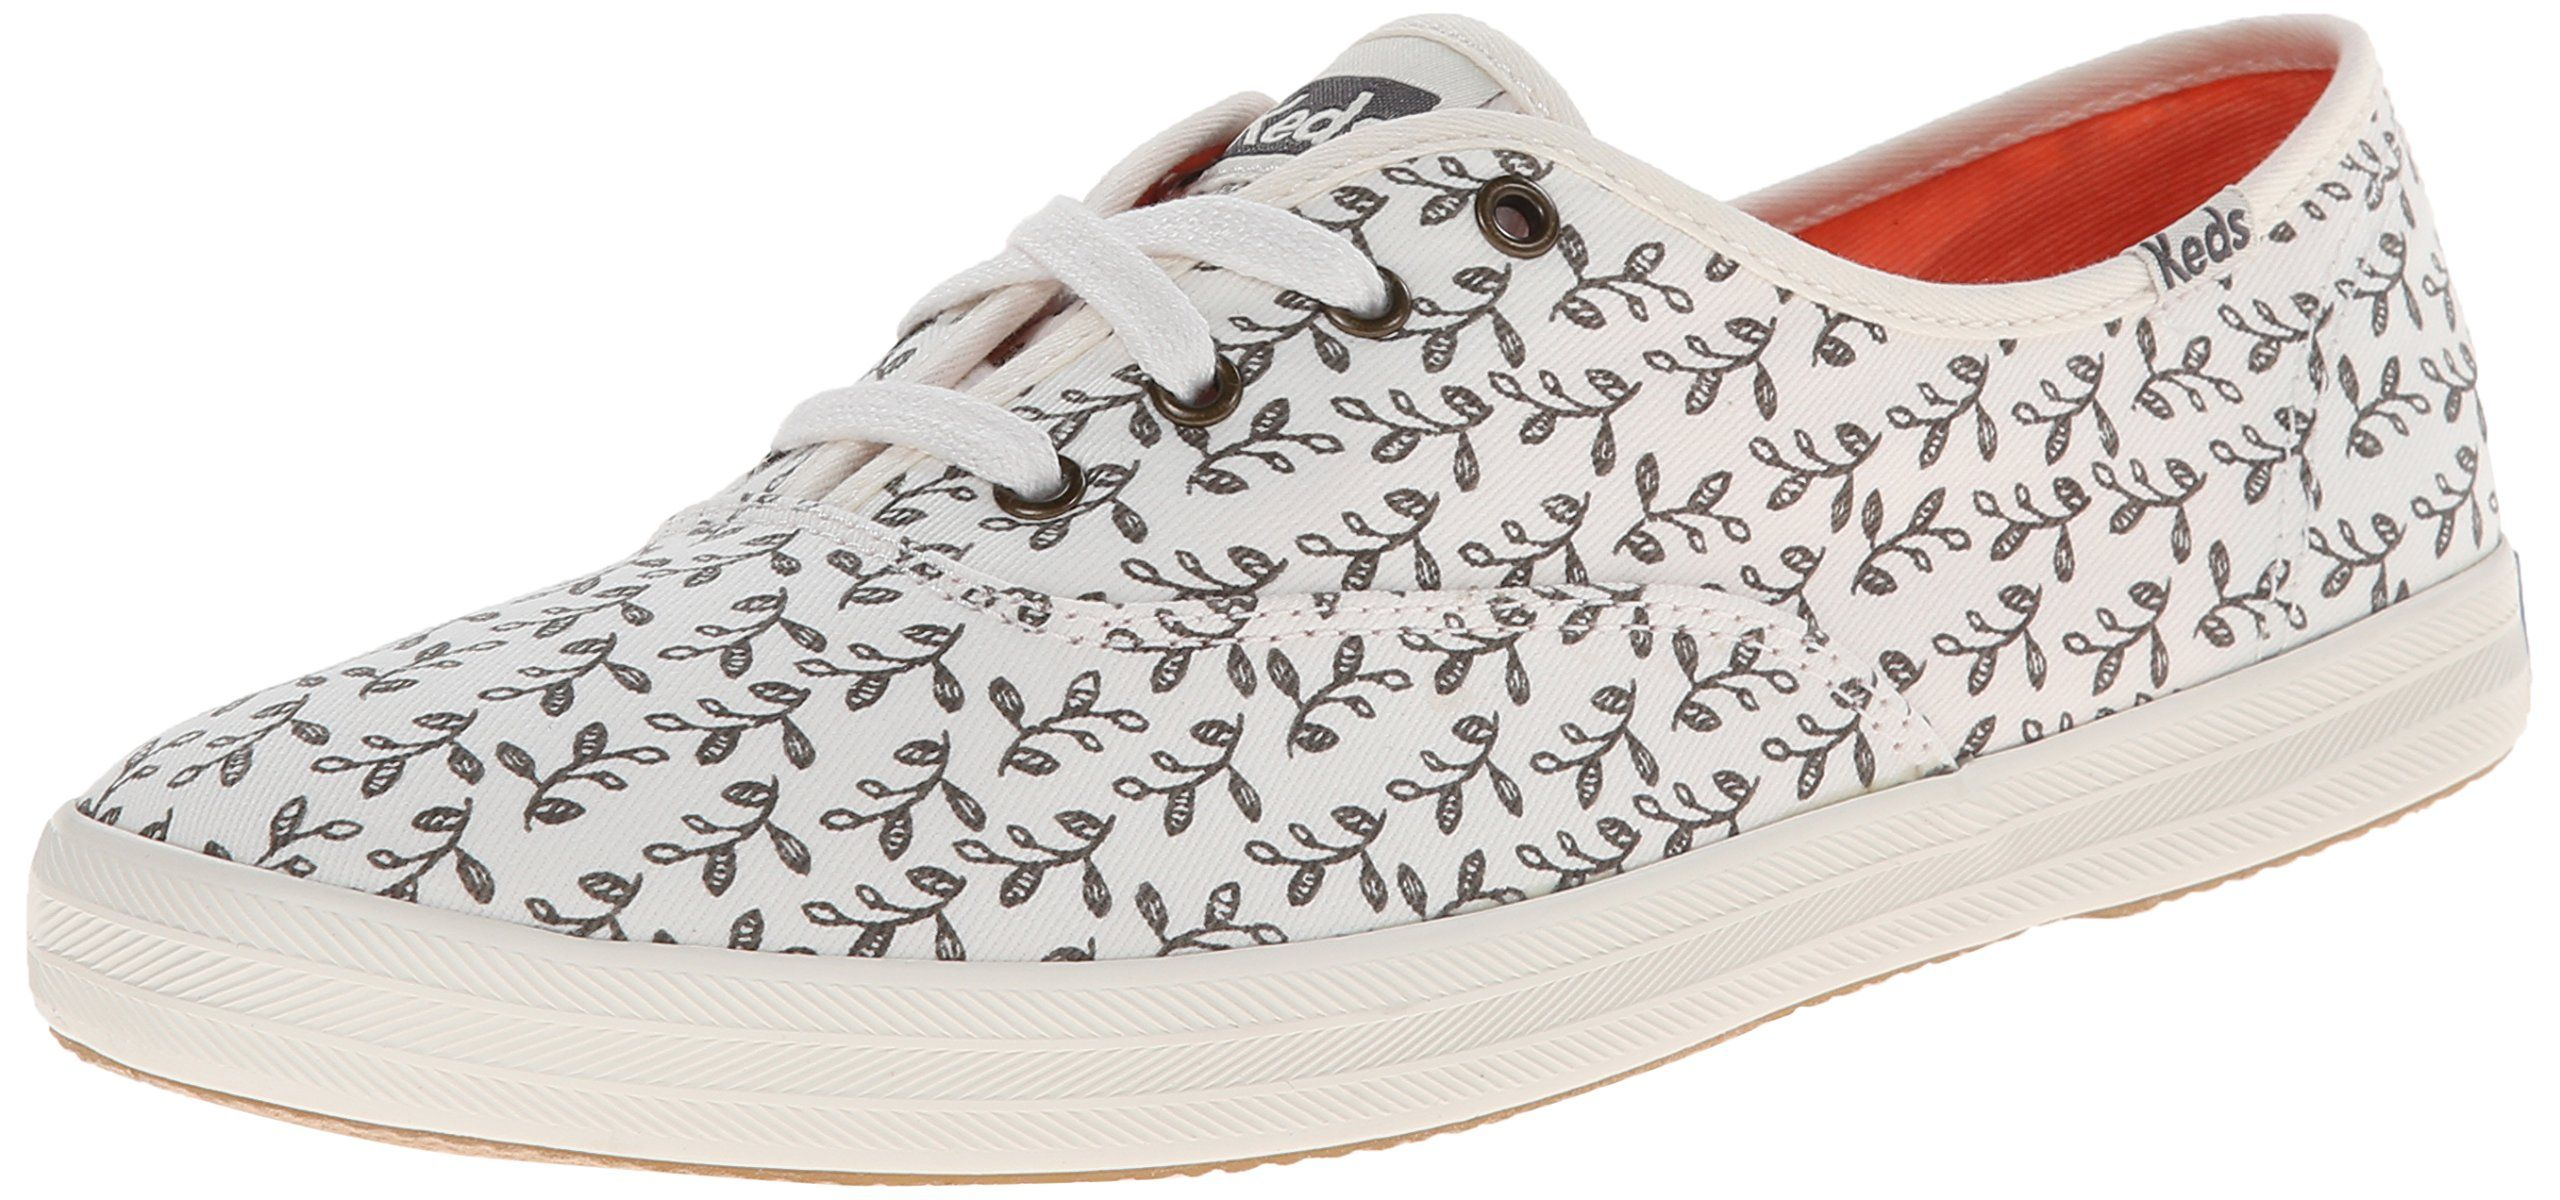 d4fd7e769c179 Amazon.com: Keds Women's Champion Botanical Leaves Fashion Sneaker ...